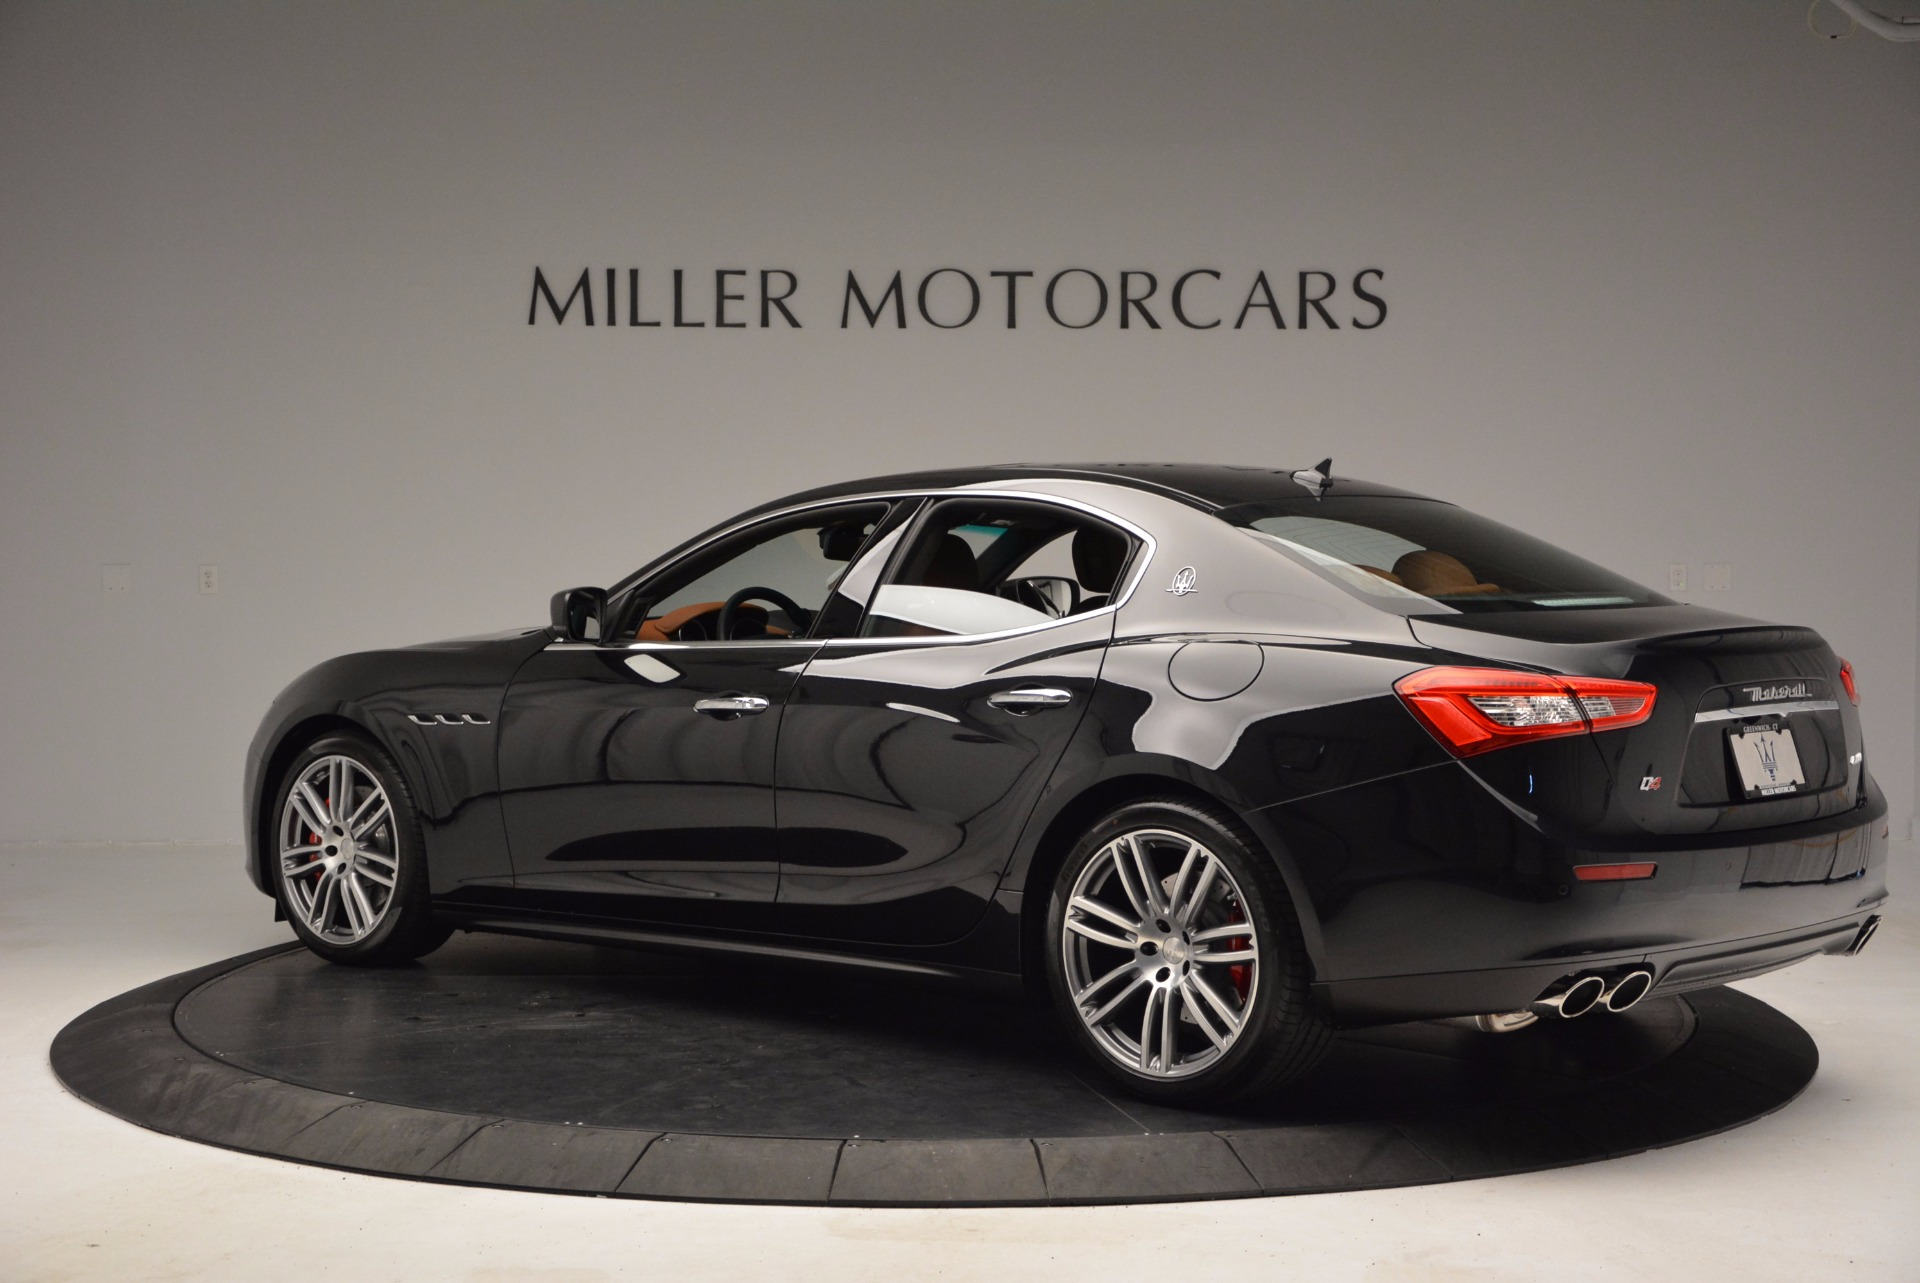 Used 2014 Maserati Ghibli S Q4 For Sale In Greenwich, CT. Alfa Romeo of Greenwich, 7249 1459_p4